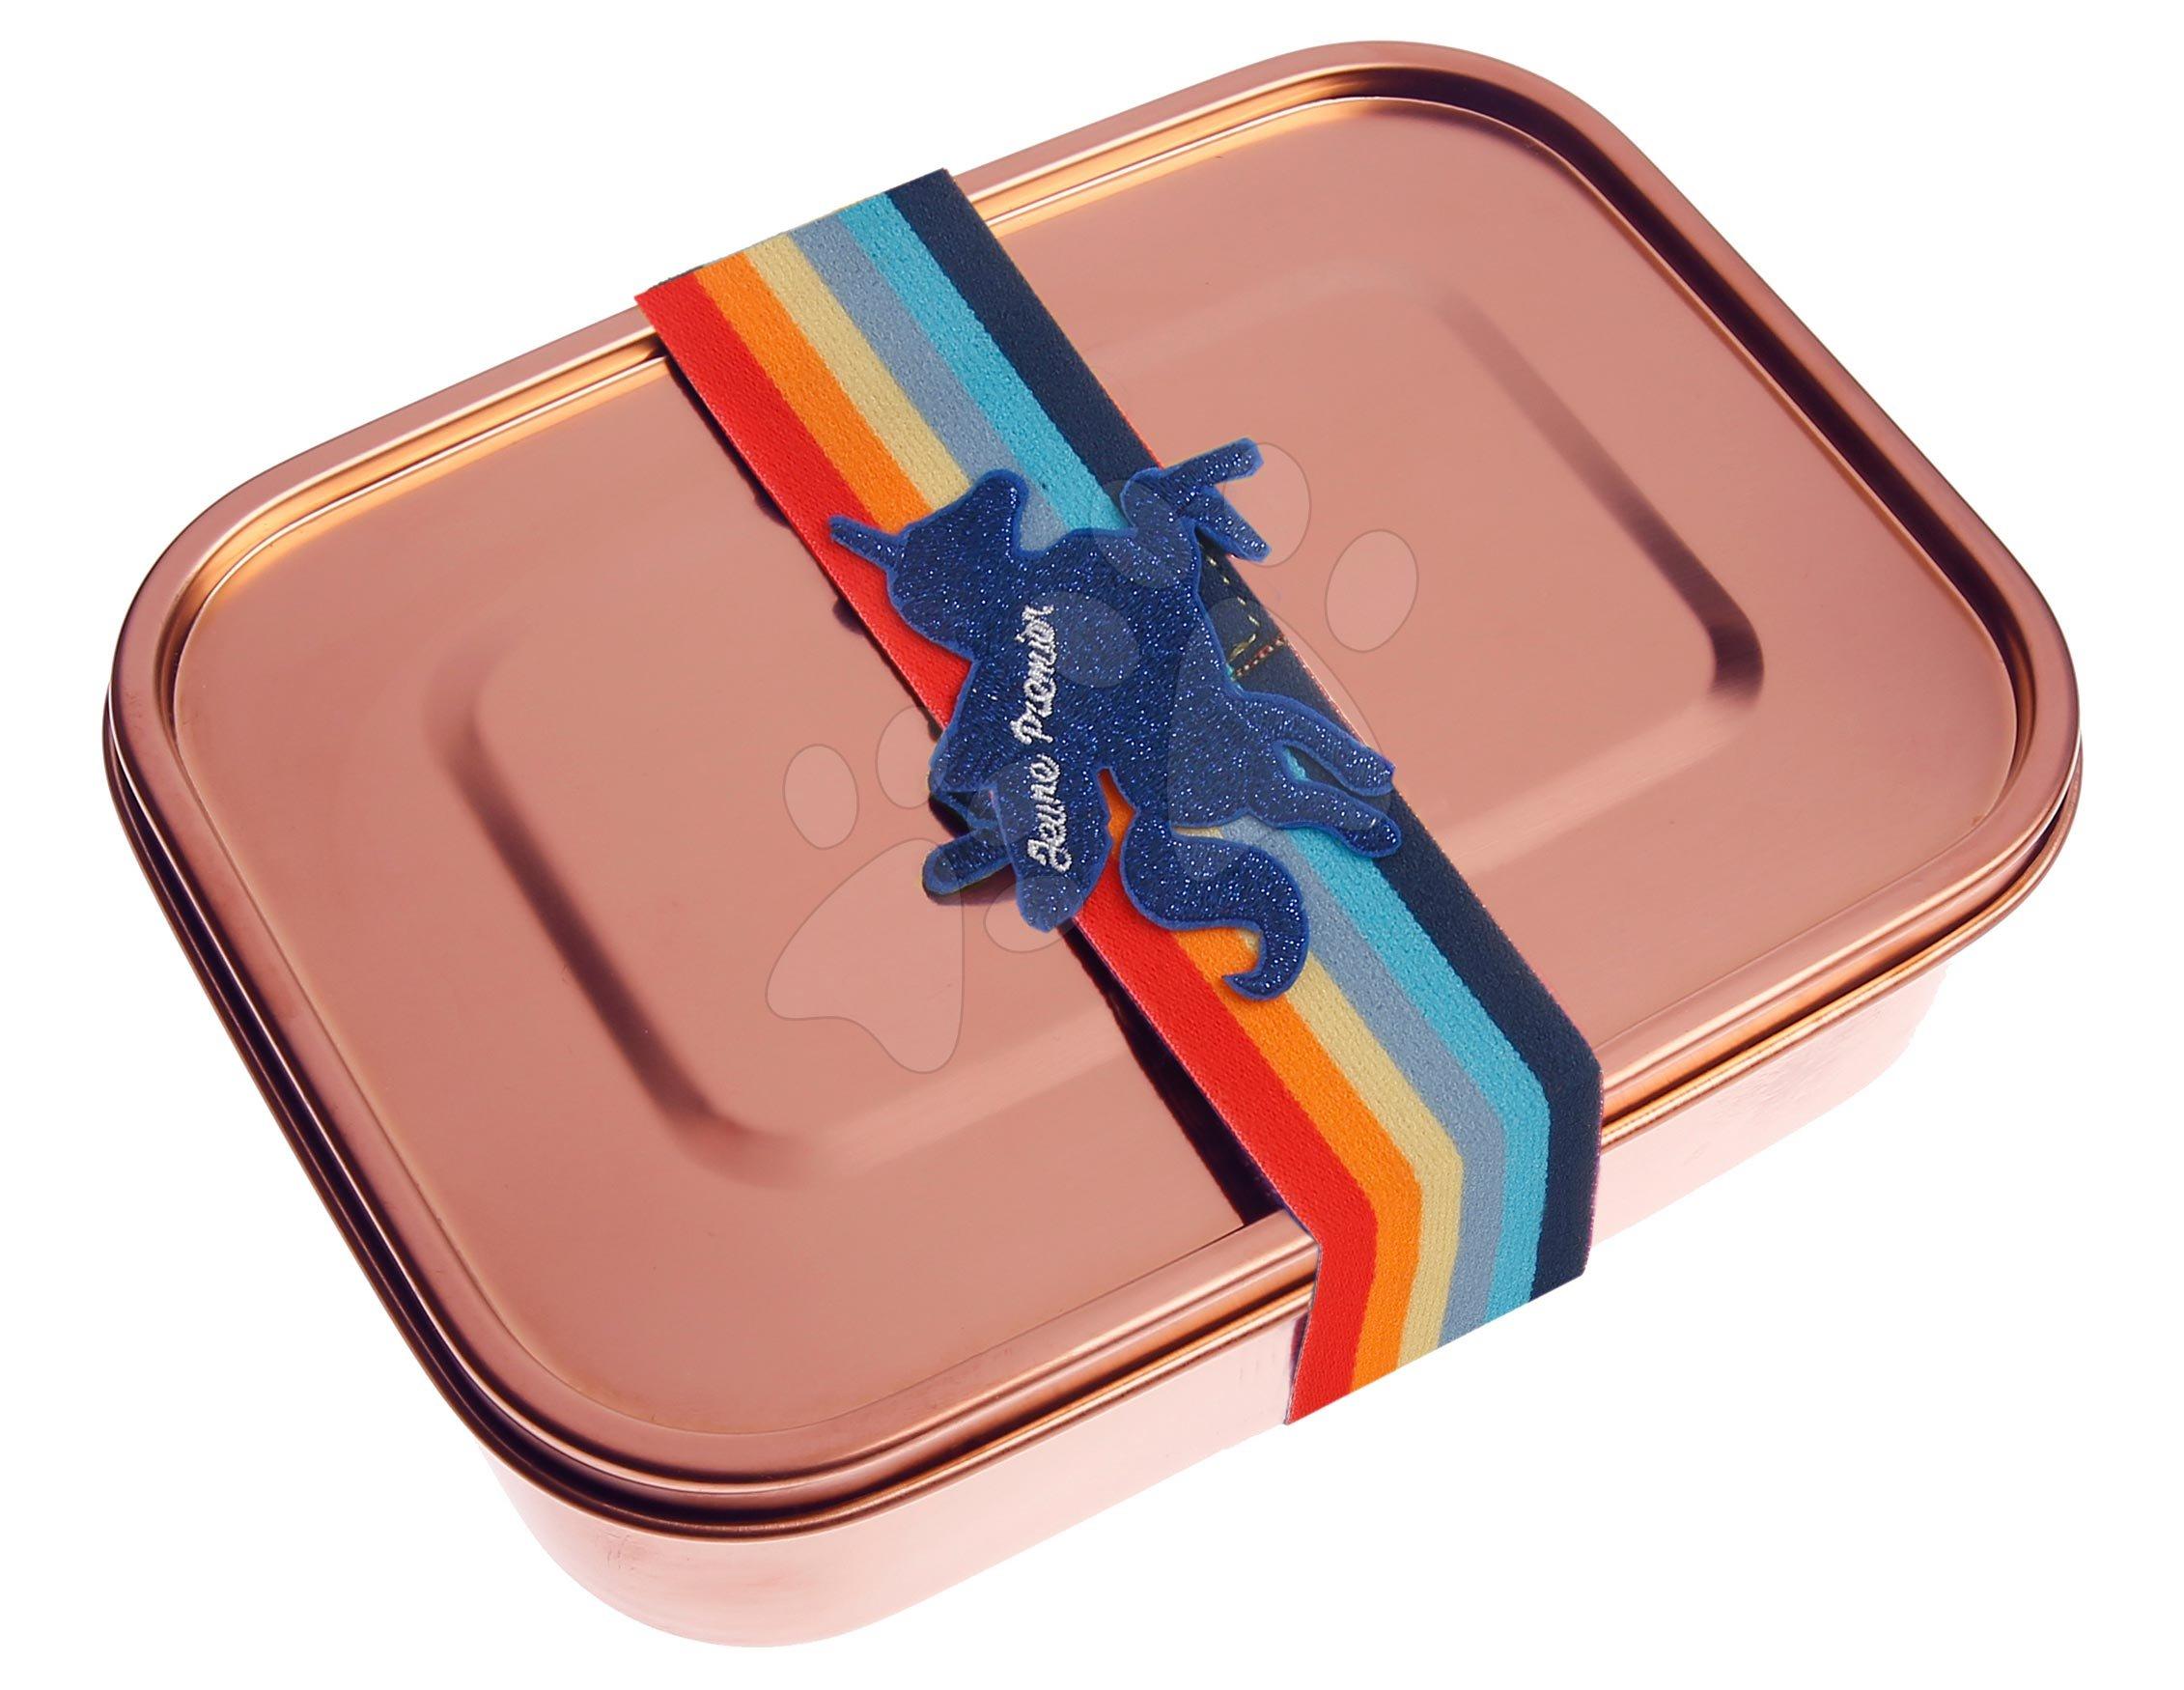 Box na desiatu Stainless Steel Lunchbox Girls Rose gold Unicorn Universe Jeune Premier 100% nehrdzavejúca oceľ luxusné prevedenie 21*7 cm